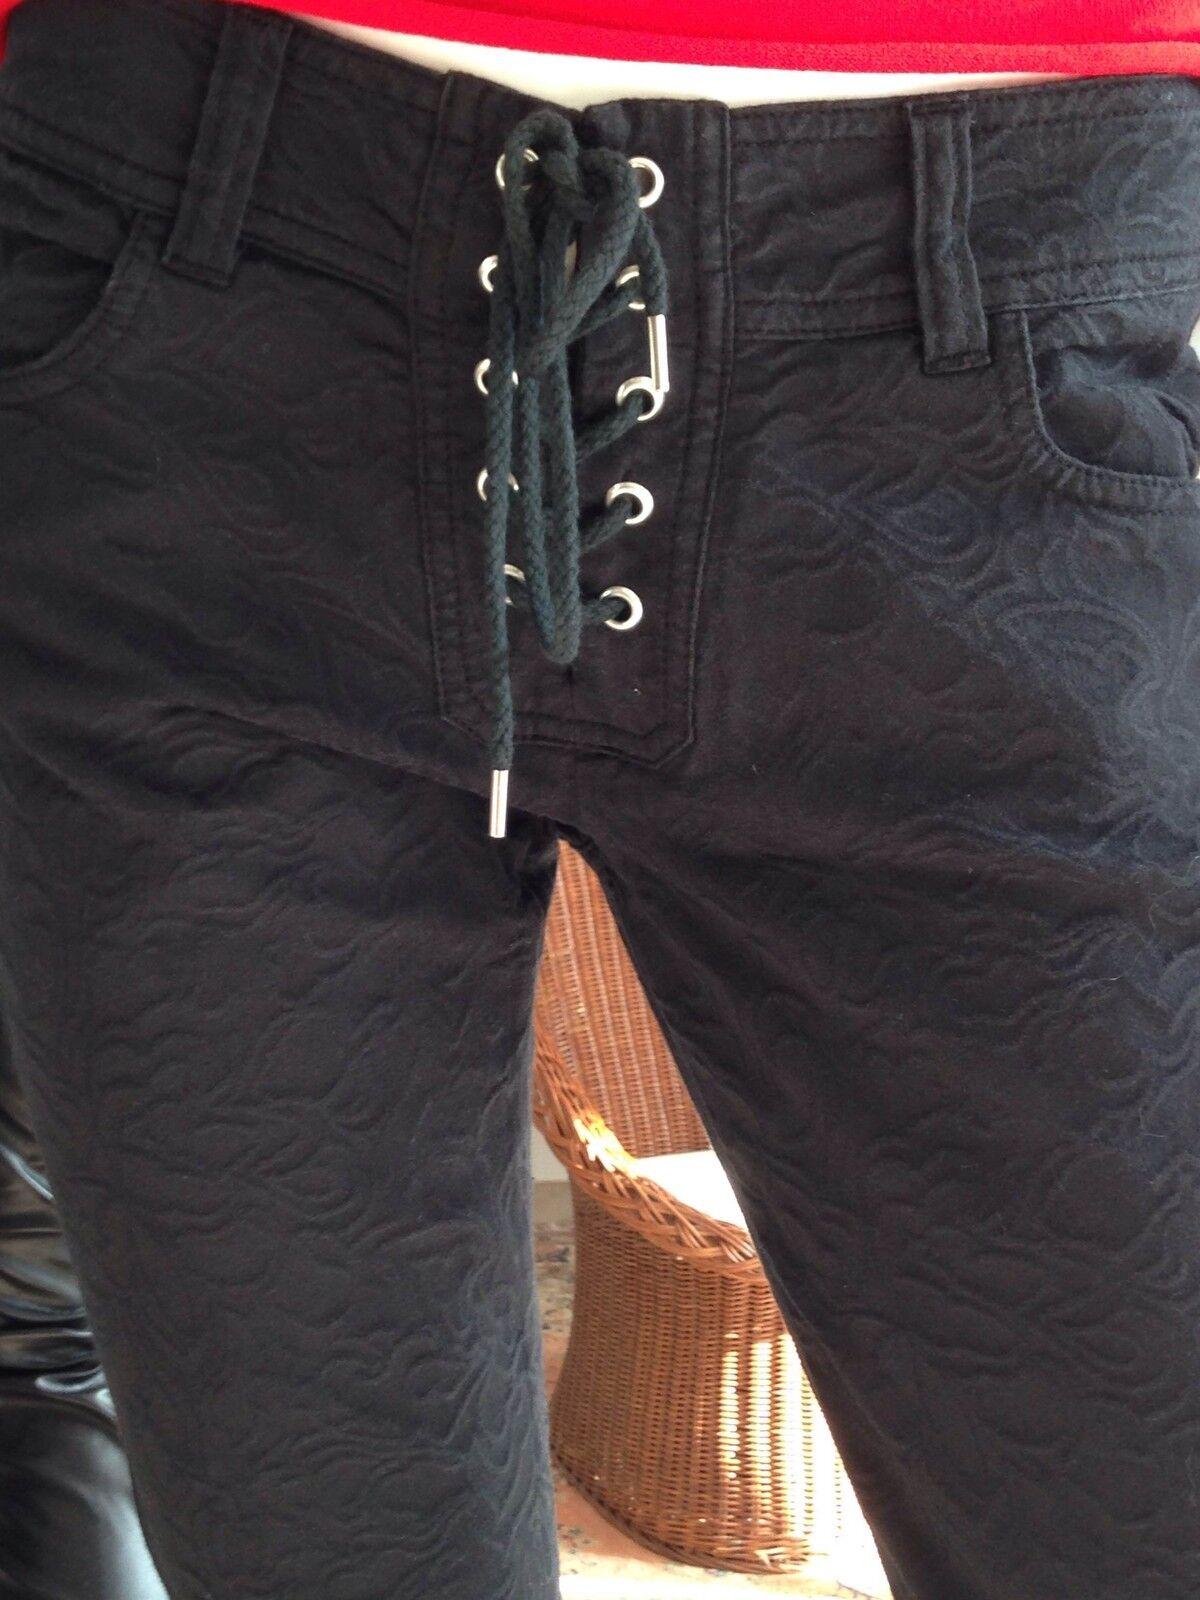 Rosa Art Jeans Tasche 5 Aid 22014 Denny 657 b7yfY6g